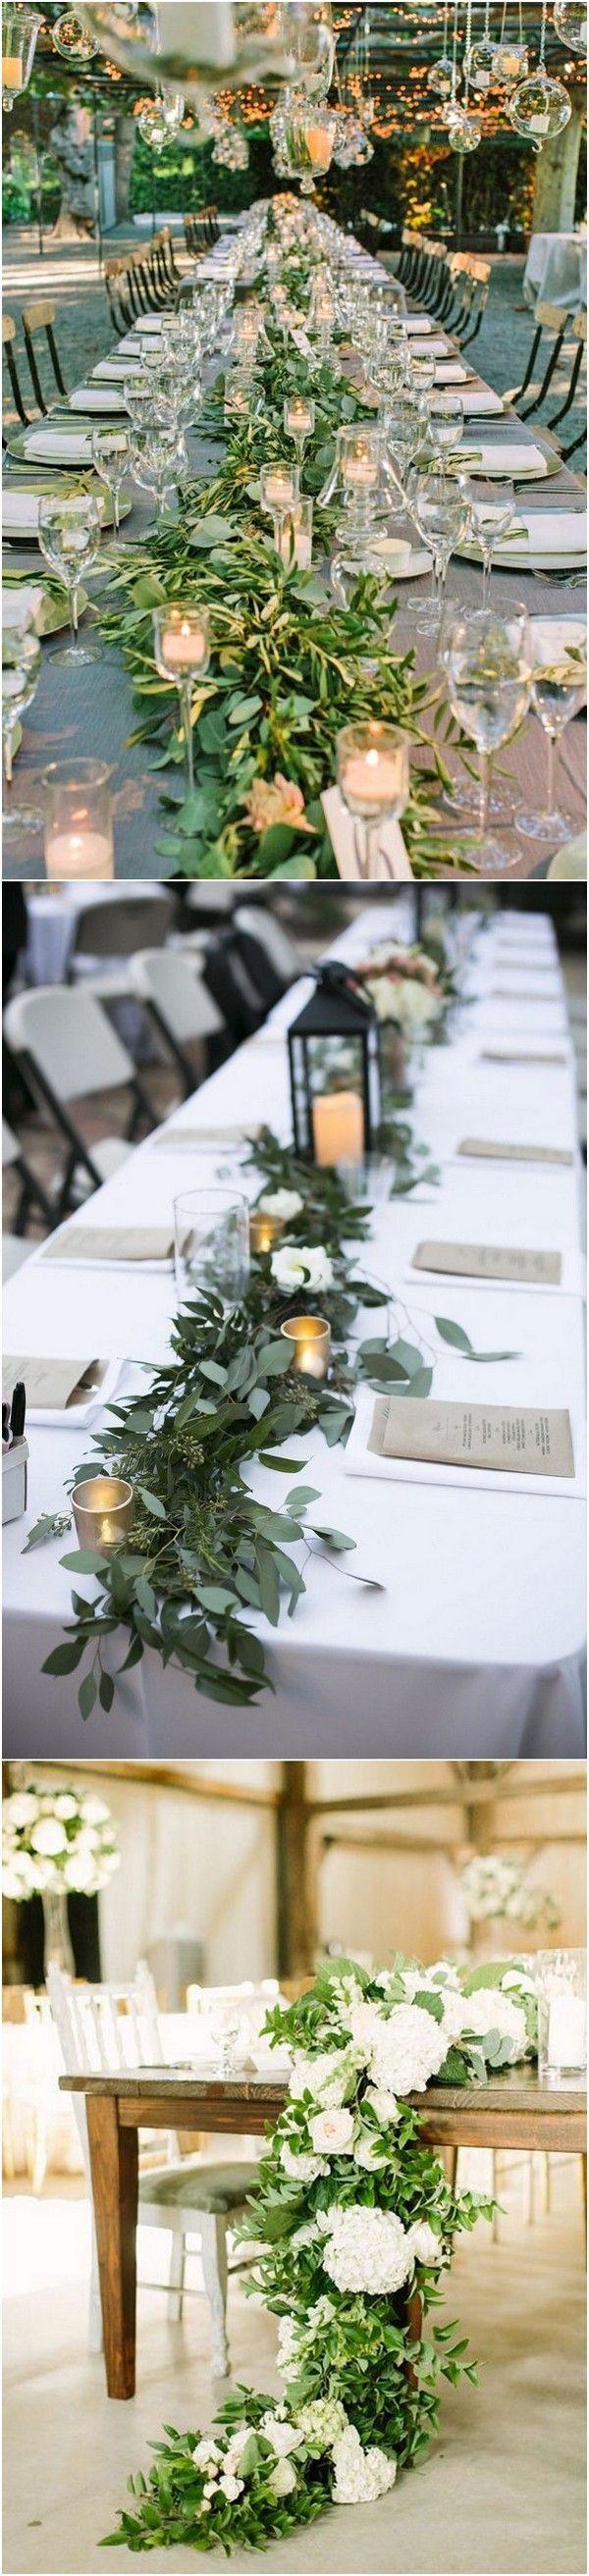 romantic greenery wedding table setting ideas for reception